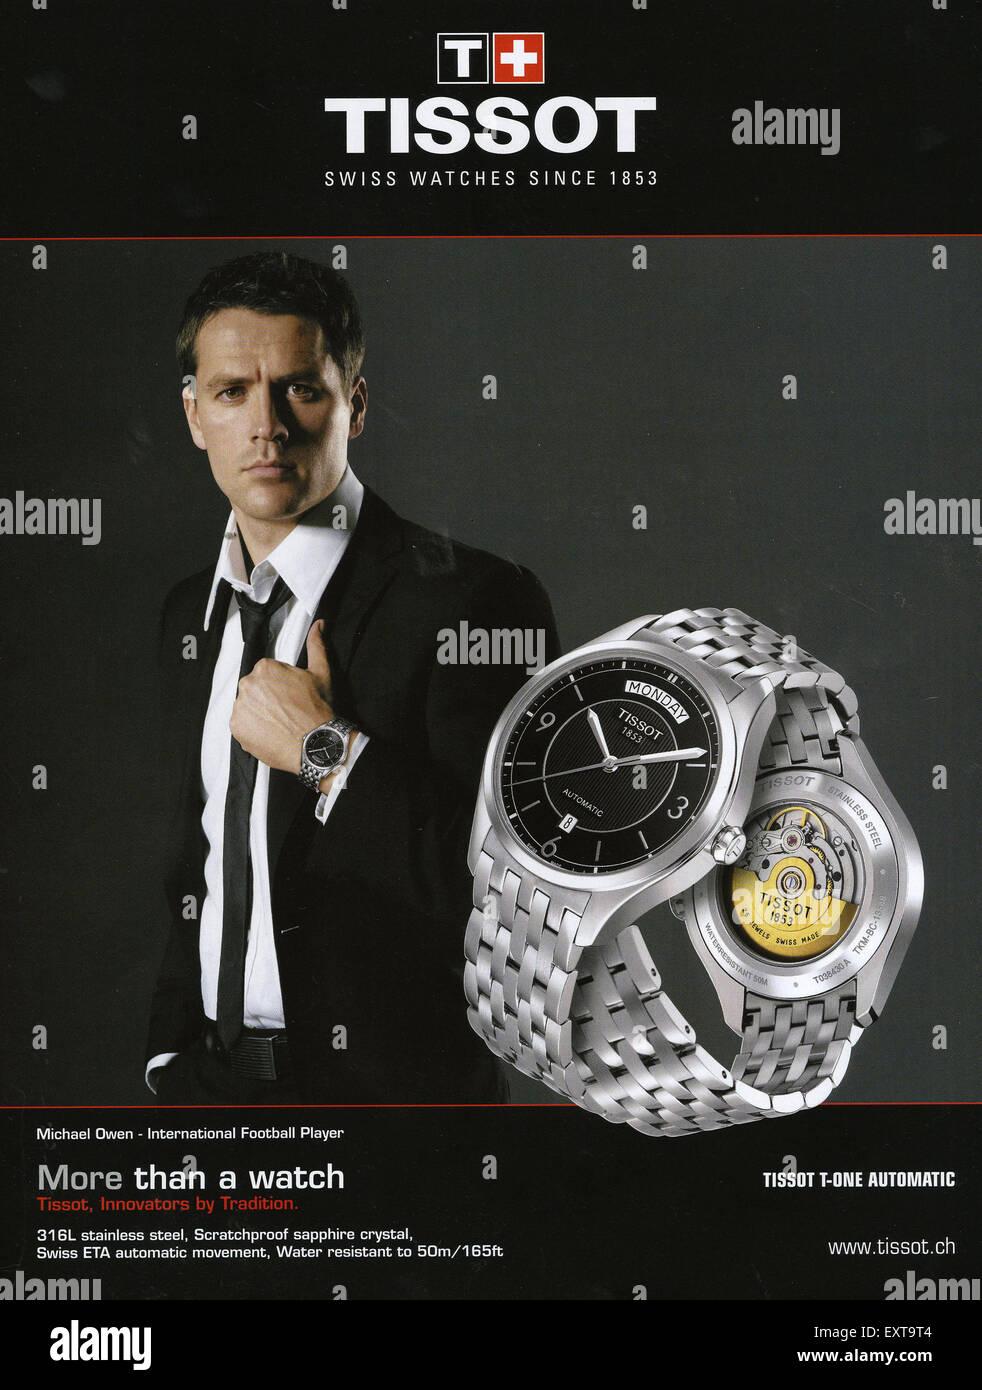 2000s uk tissot magazine advert stock photo 85357108 alamy for Celebrity tissot watch